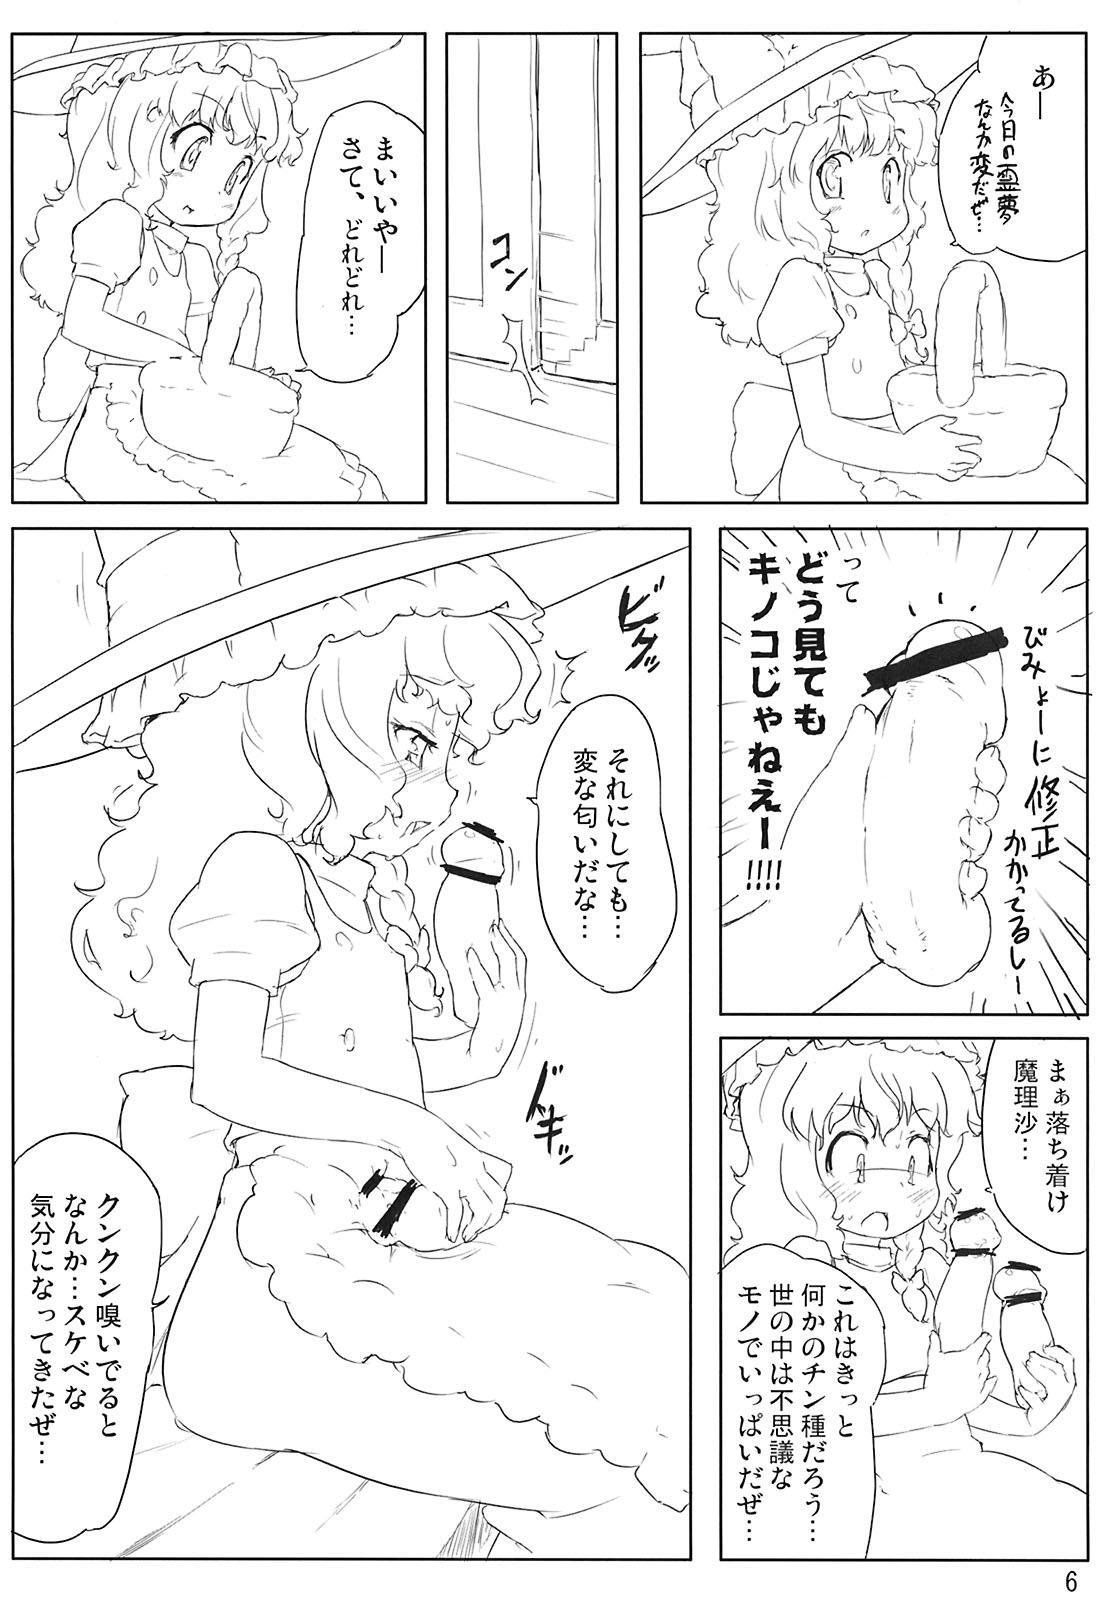 Kirisame Kinoko Jiken - cream of mushroom soup 5